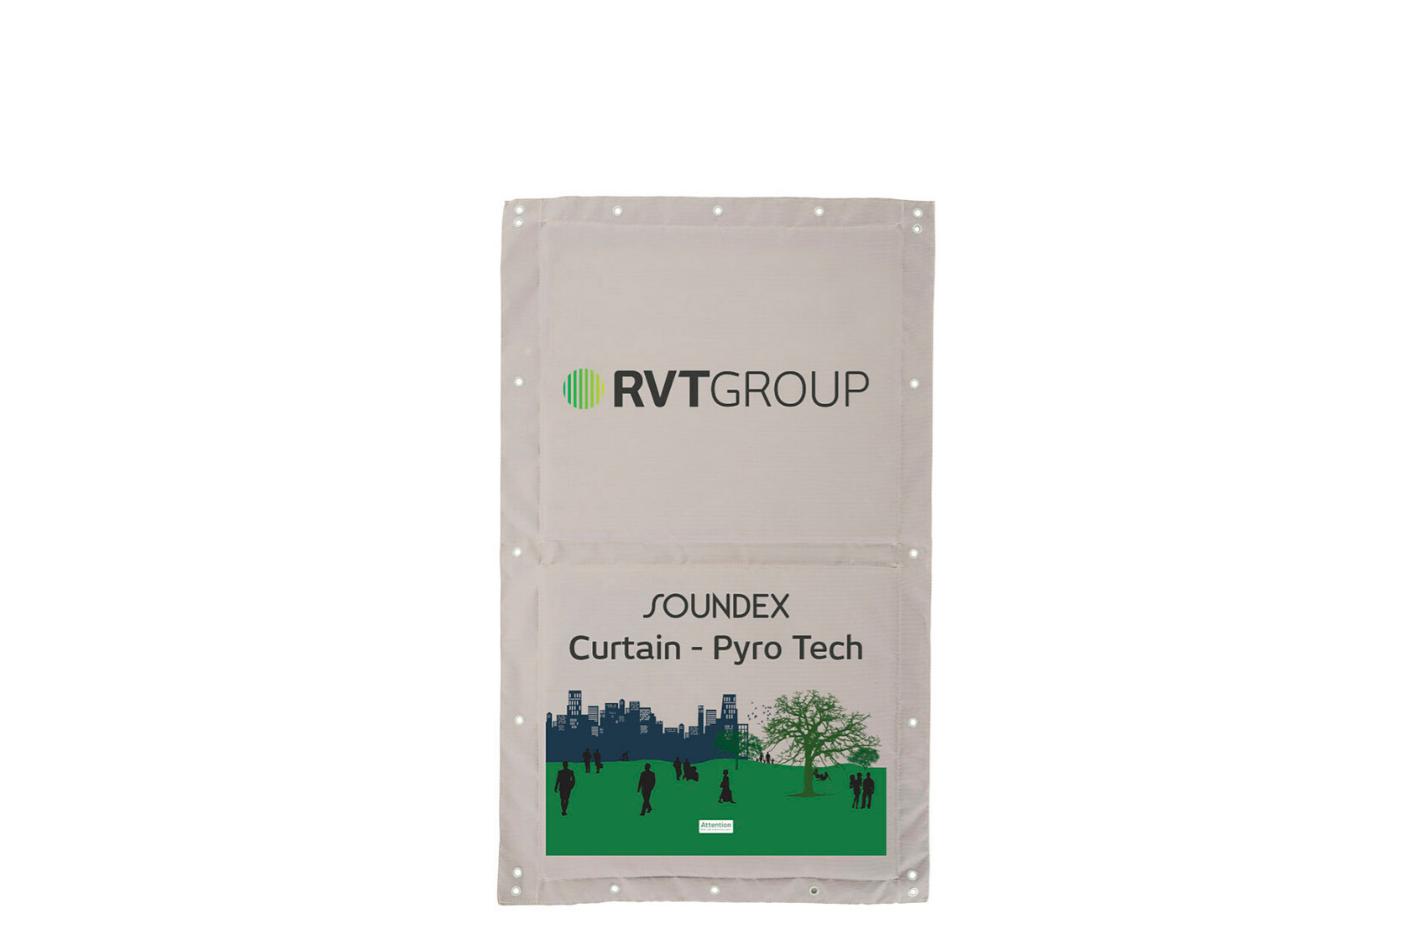 Soundex Curtain Pyro Tech